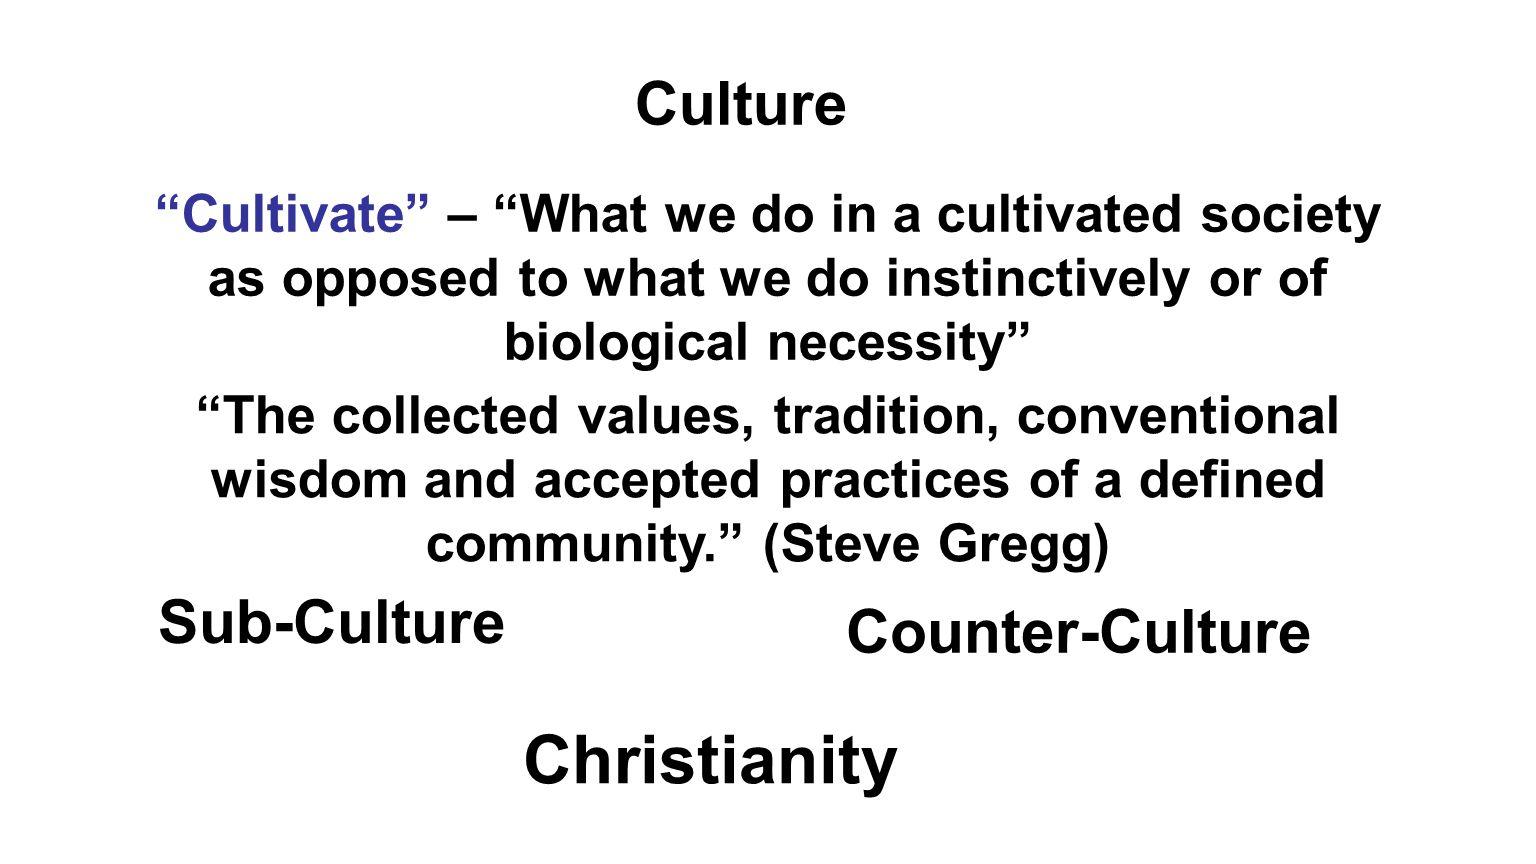 Christianity Culture Sub-Culture Counter-Culture